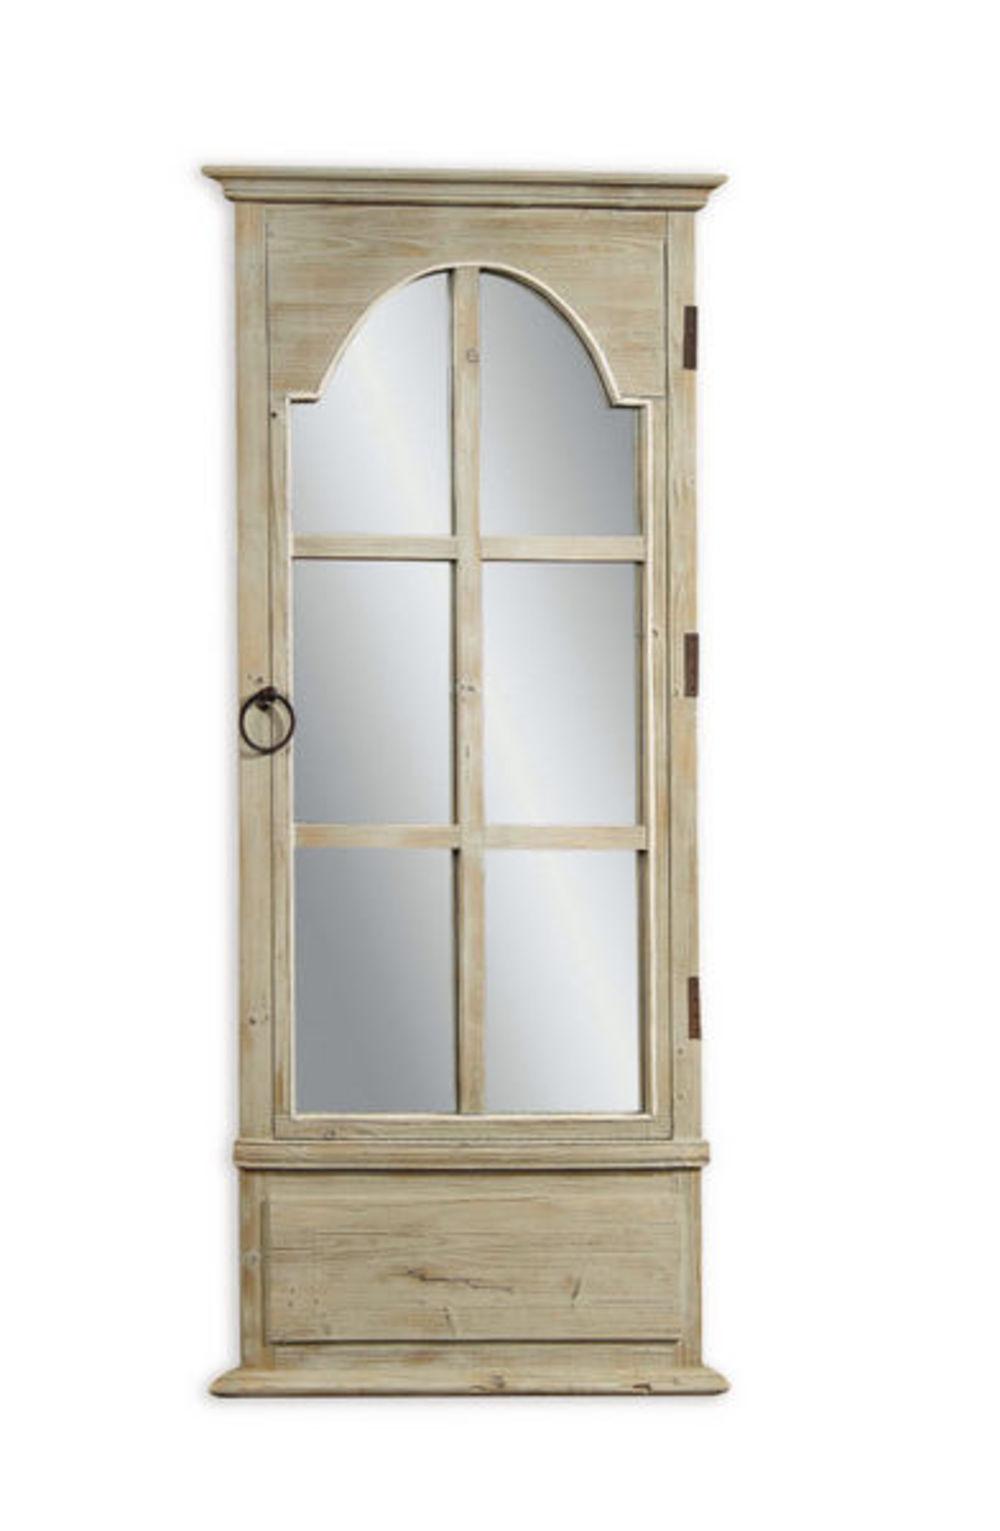 Bassett Mirror Company - French Door Leaner Mirror